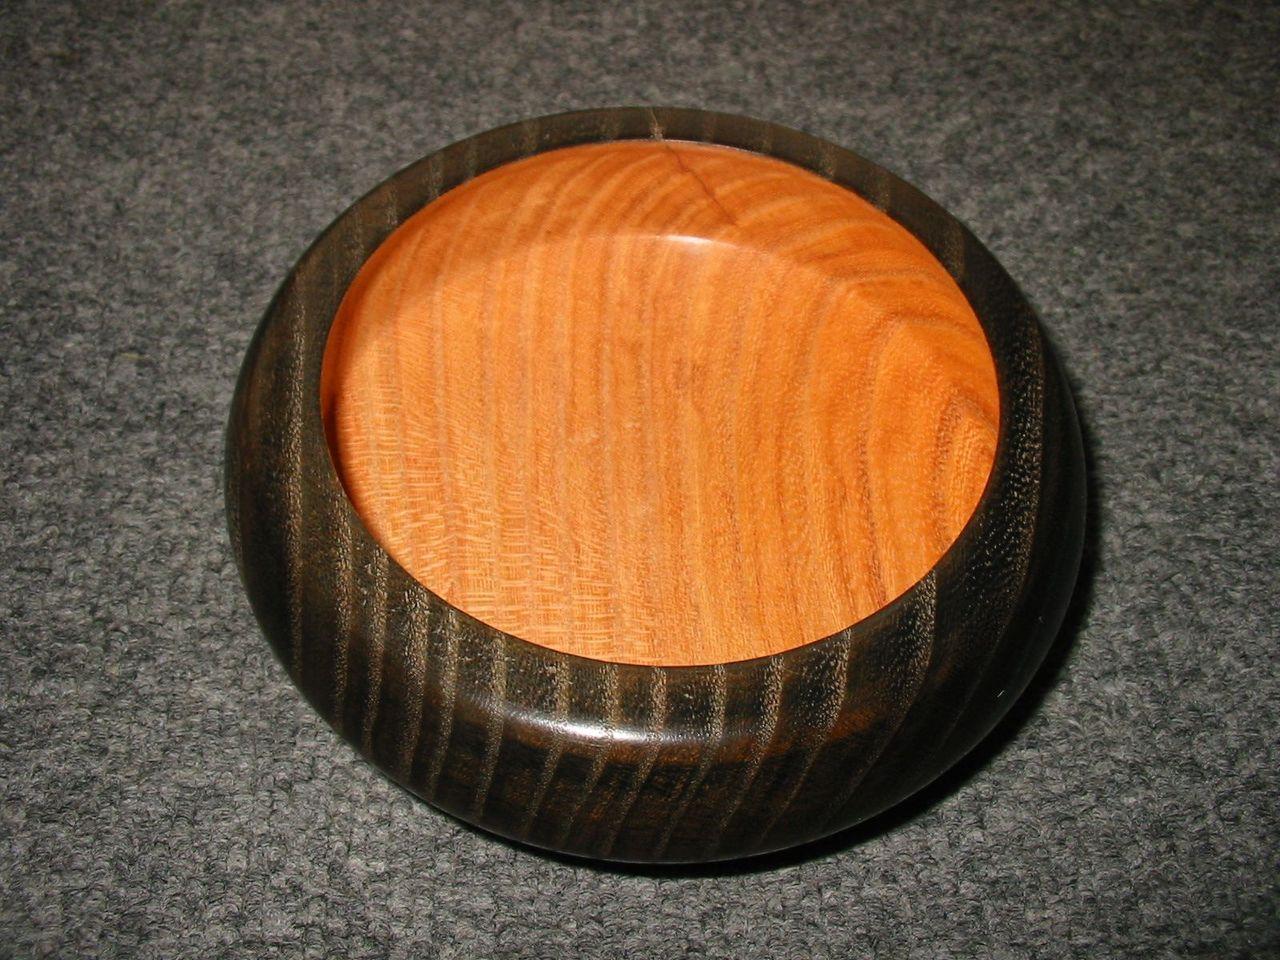 Ebnonized+bowl